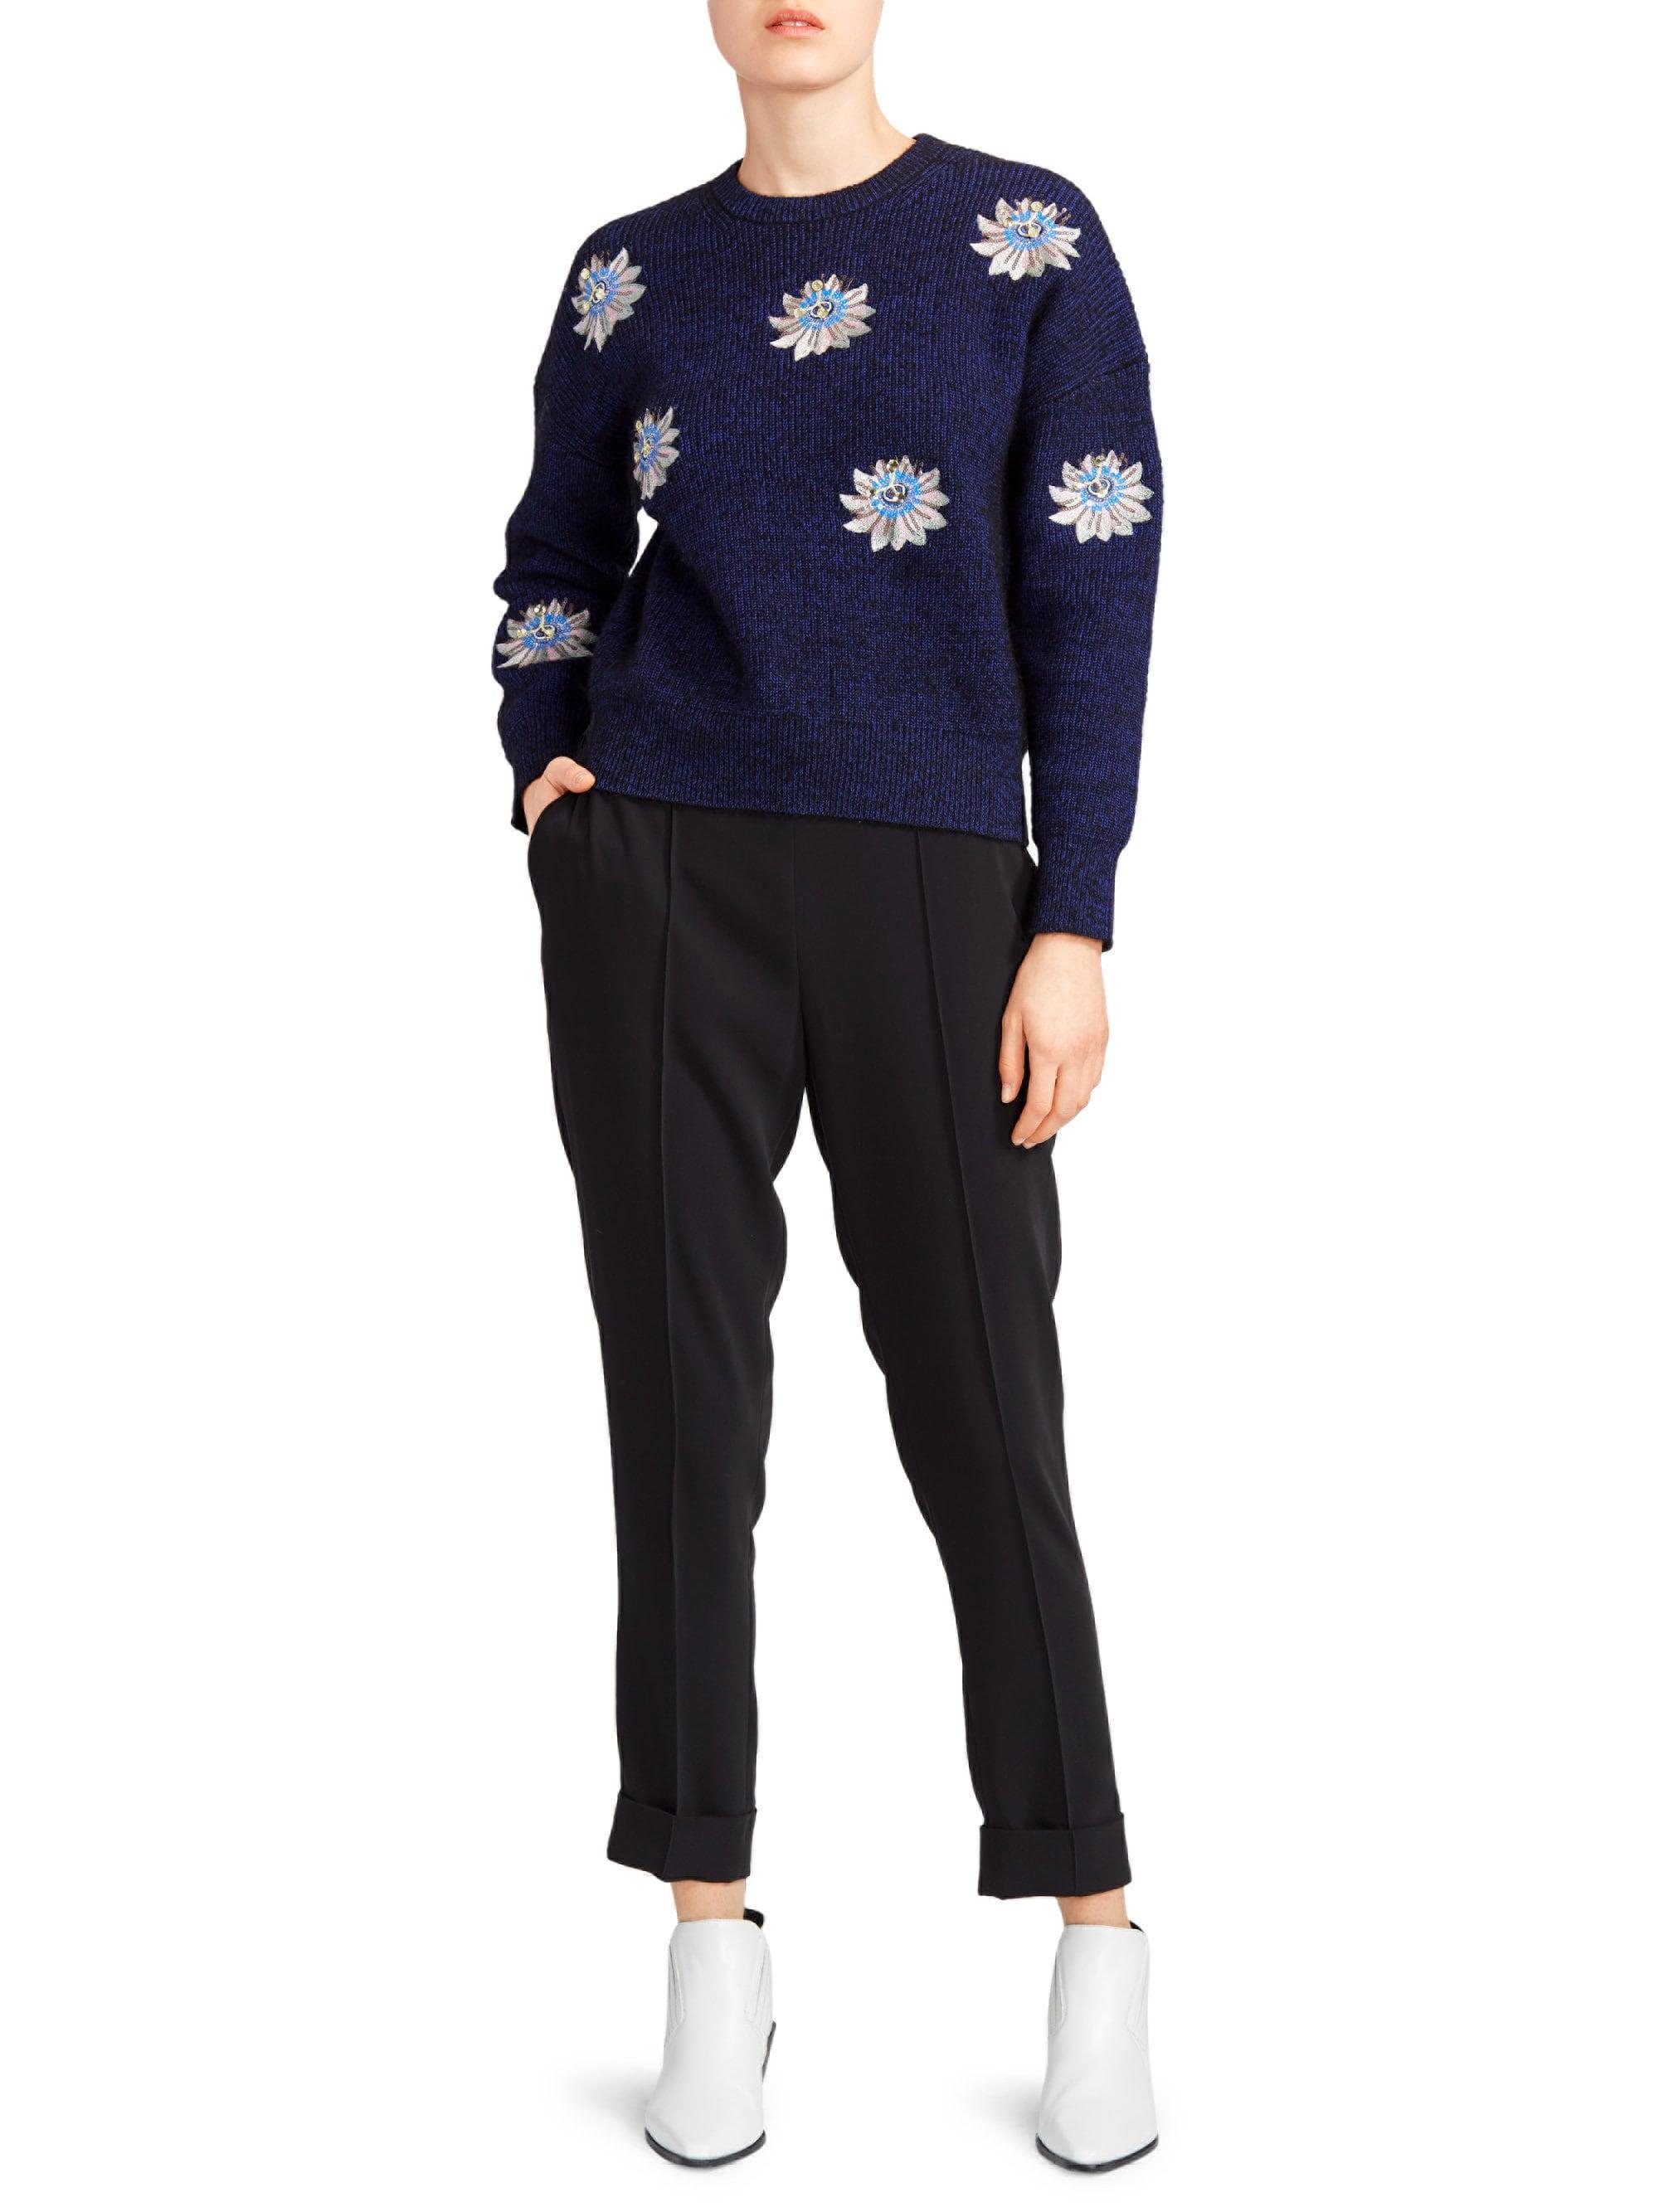 448976d8fe KENZO Passion Flower Sweater in Black - Lyst